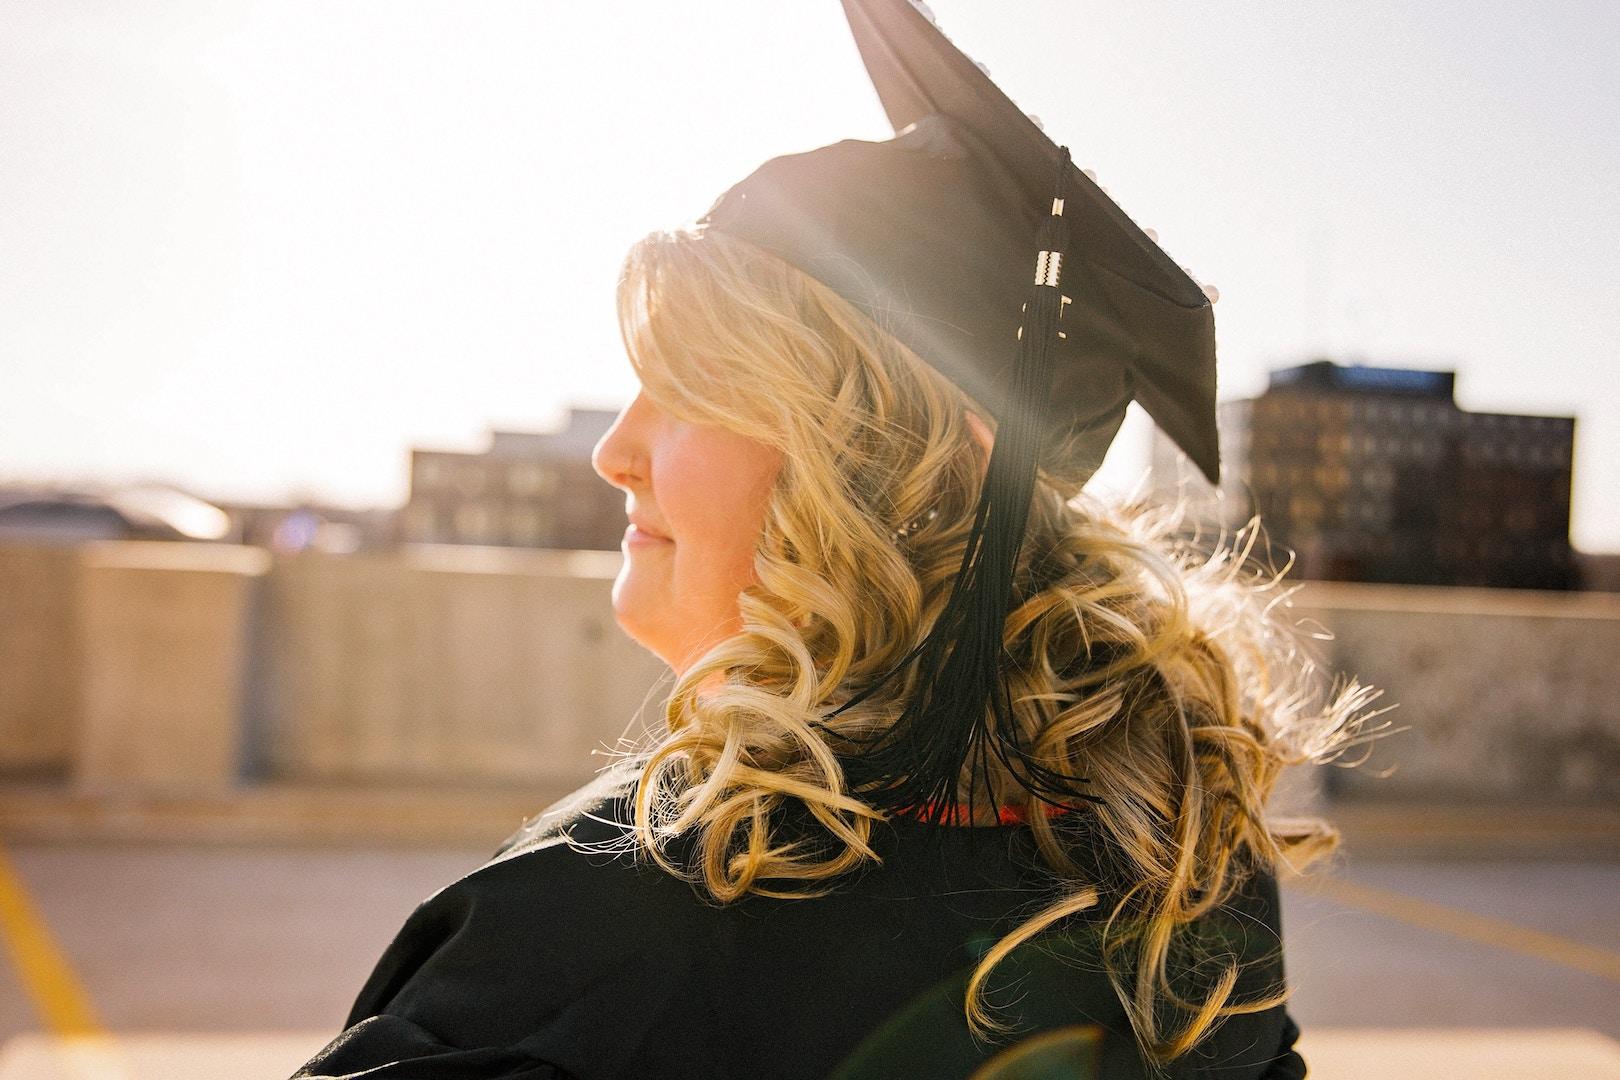 graduate-cap-sun-blonde-woman